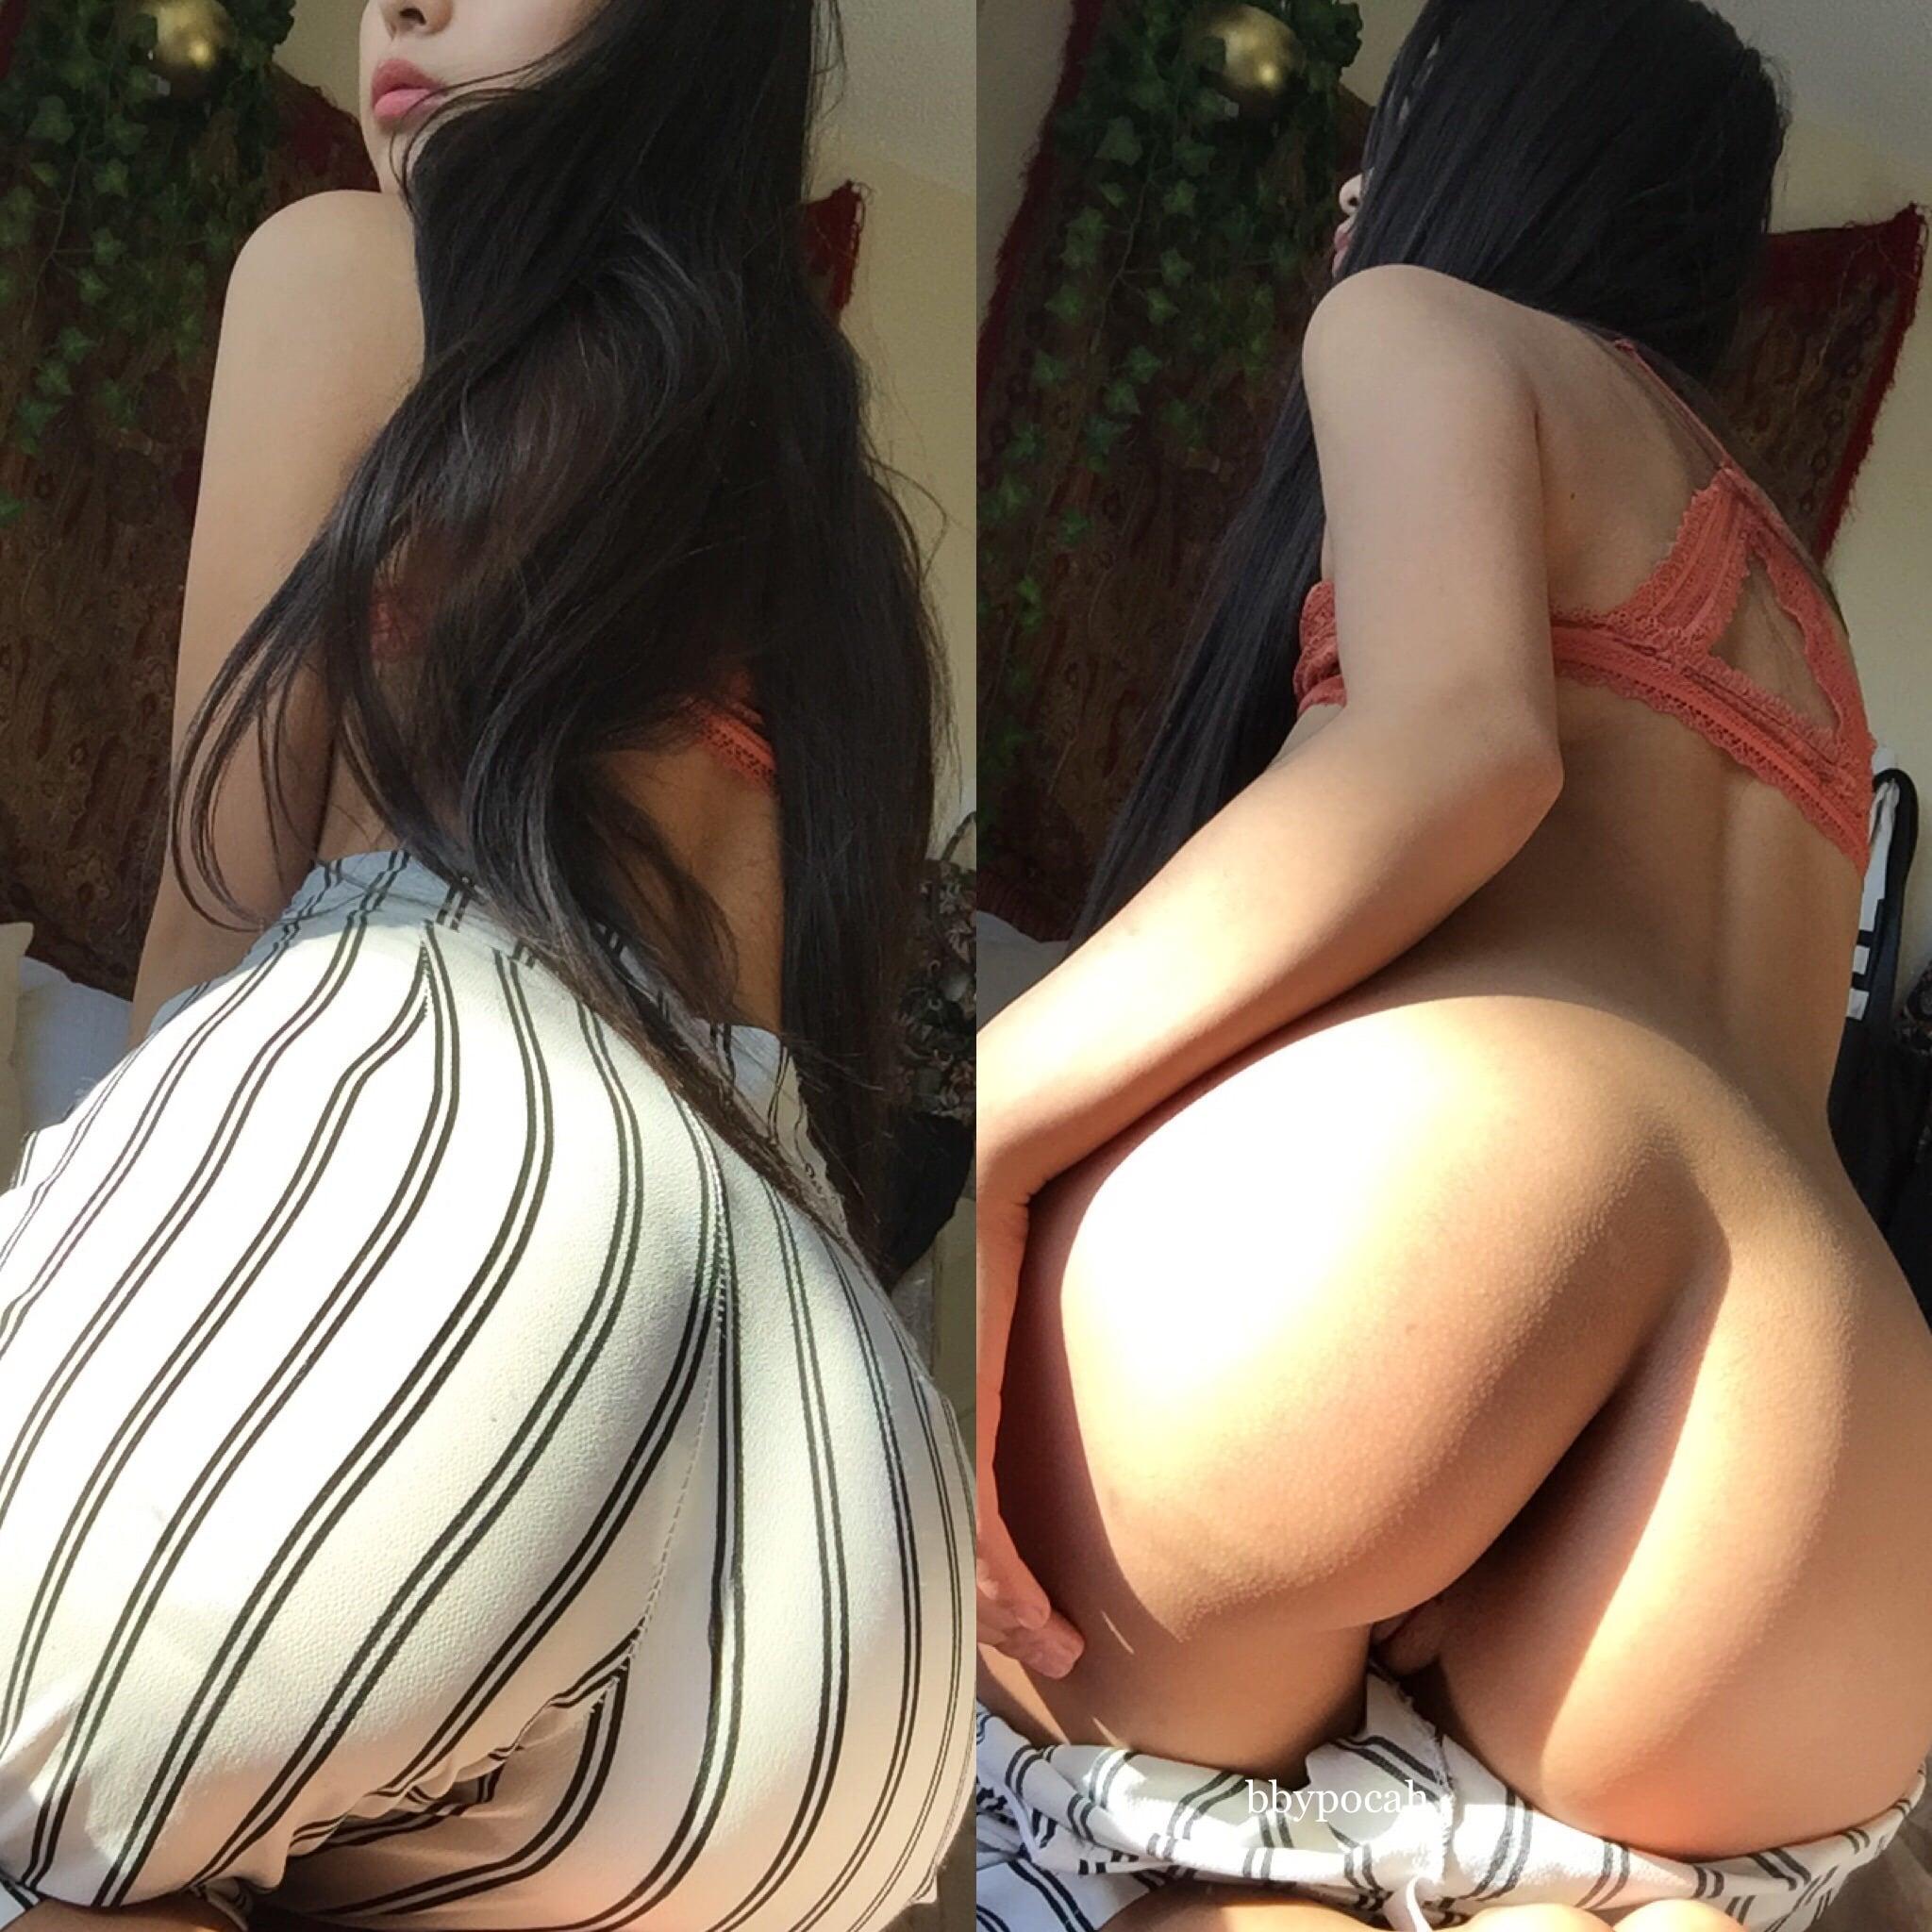 https://sexyna.org/wp-content/uploads/2019/09/Holky-před-a-po-40.jpg